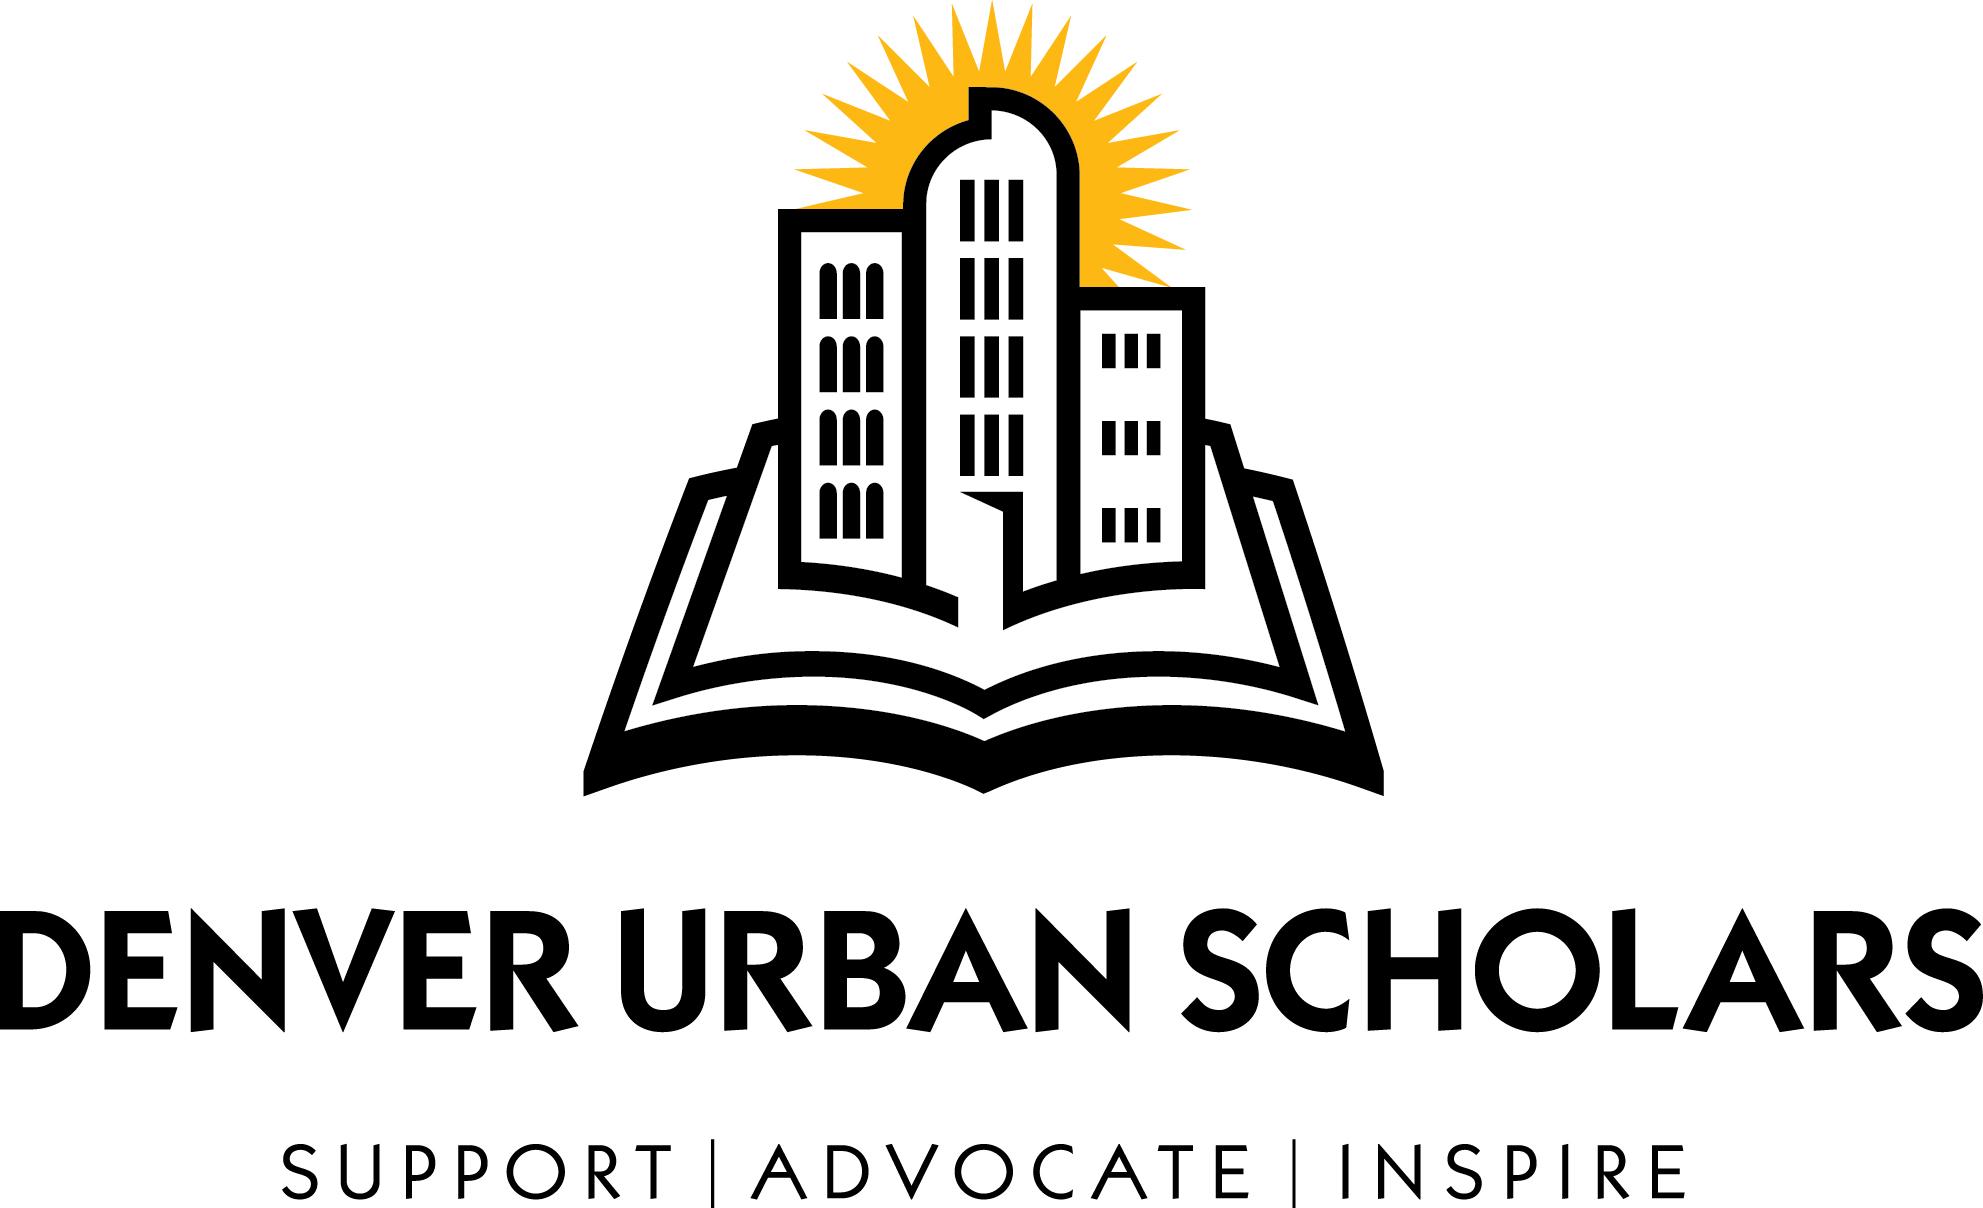 Denver_Urban_Scholars_logo (2).jpg